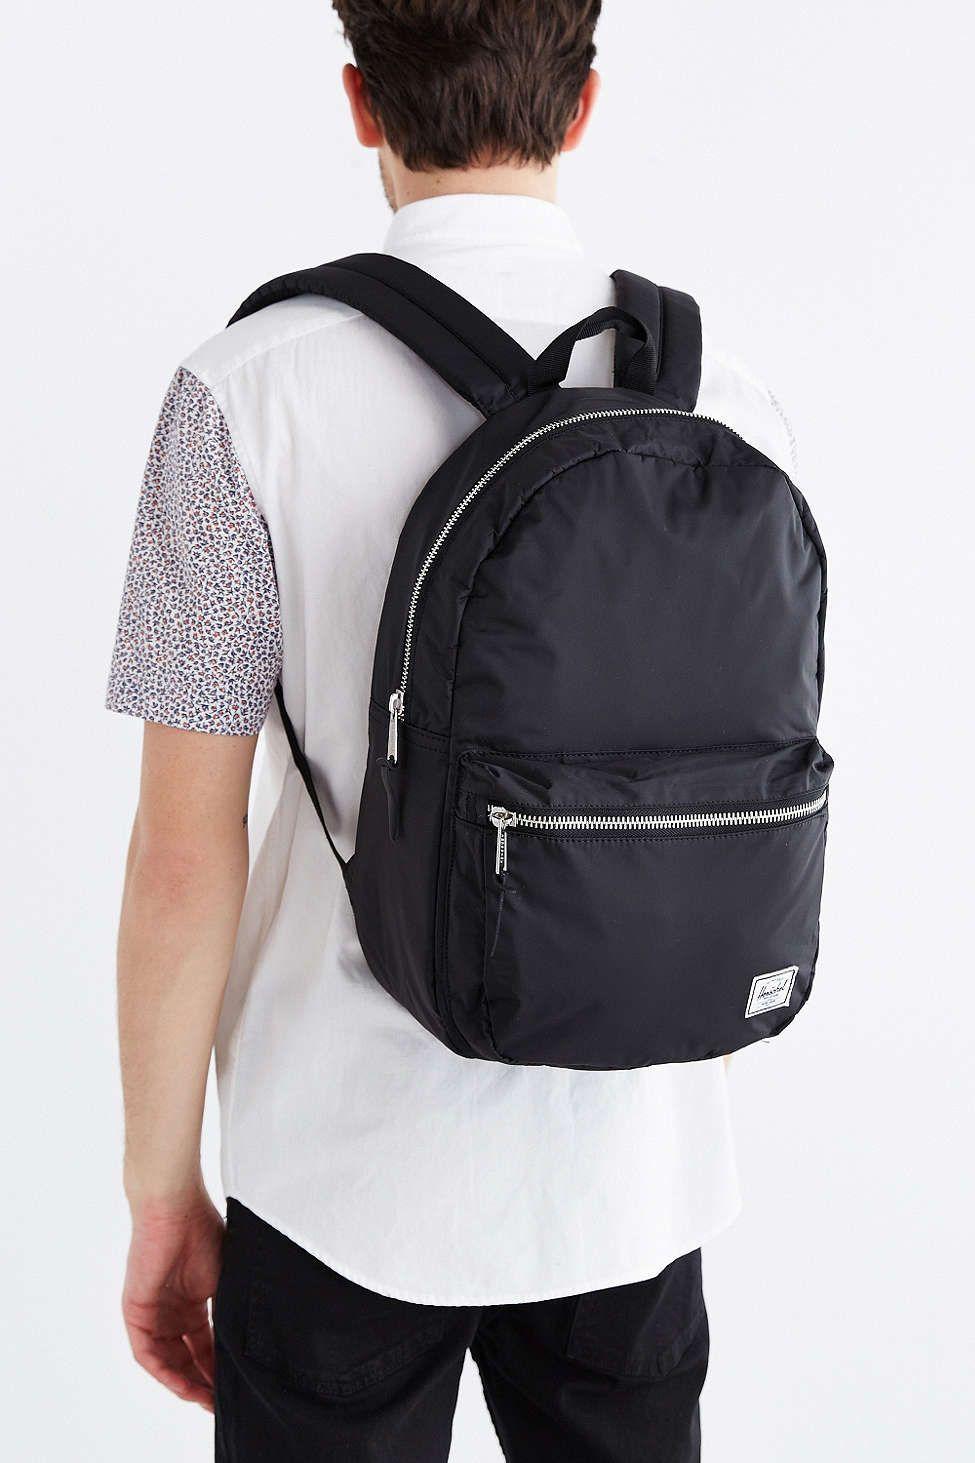 f8b13adcca Herschel Supply Co. Lawson Nylon Backpack